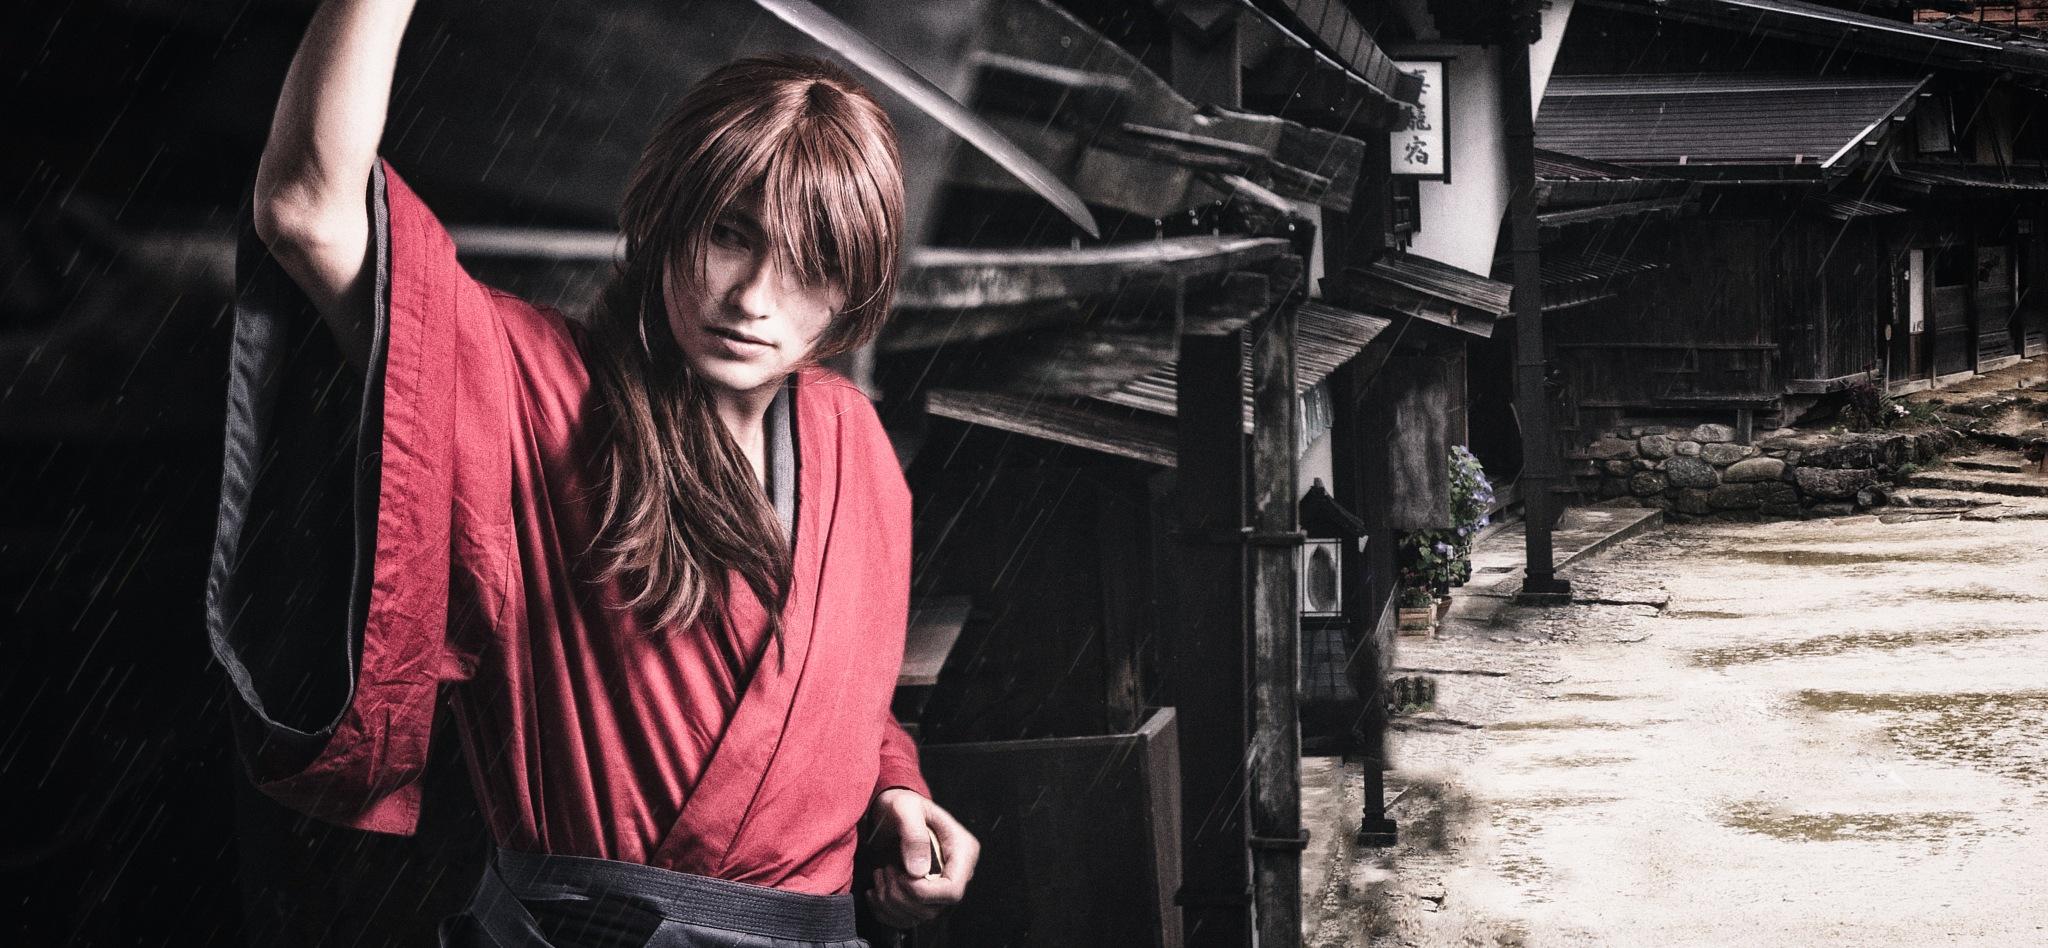 KenshinBR - Photography and edition By Eduardo Portas Photography by Renato Ikeda